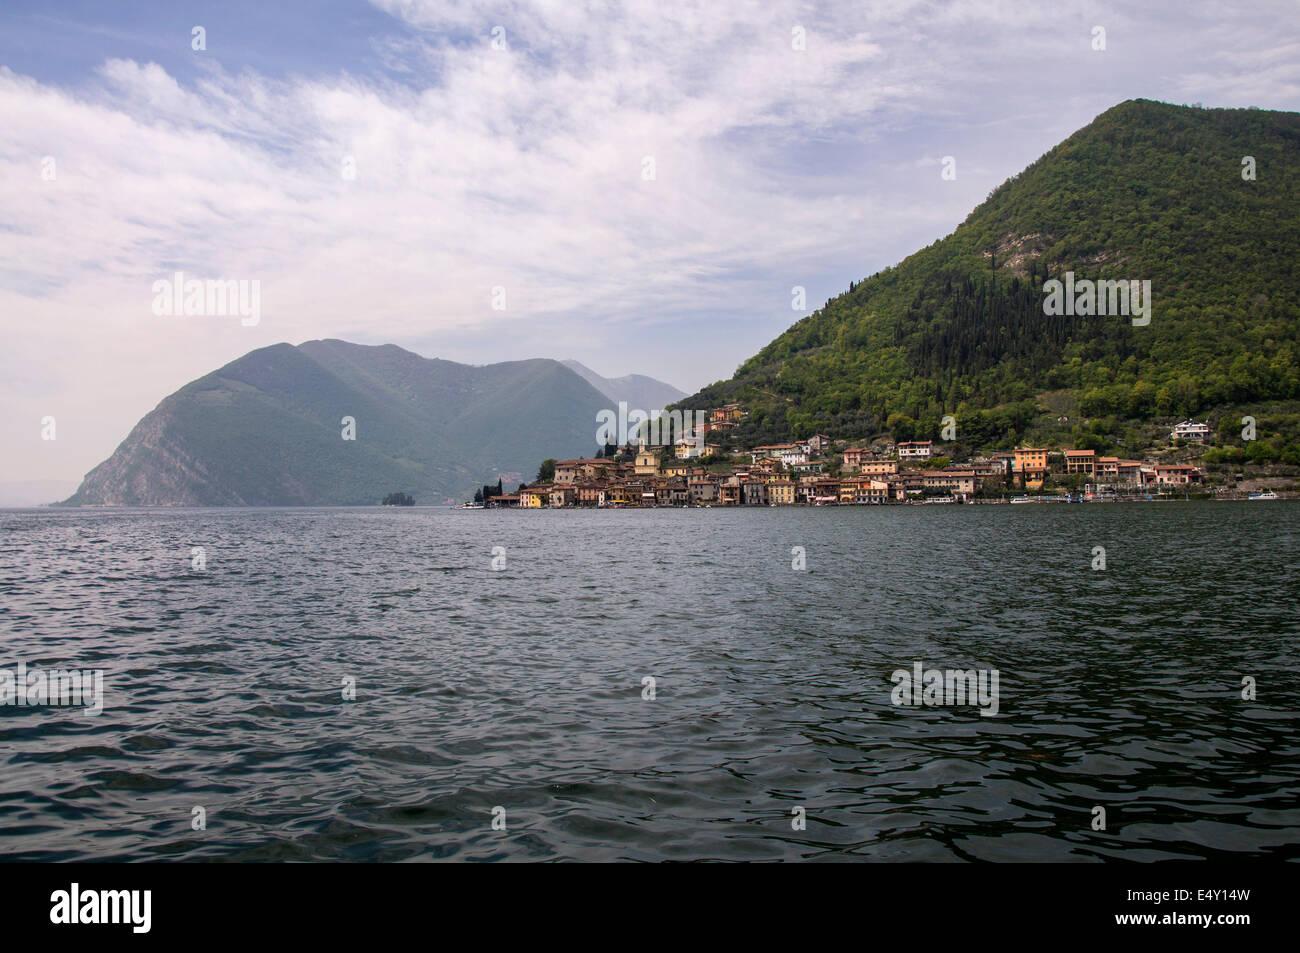 Peschiera on Monteisola on Lake Iseo Italy - Stock Image